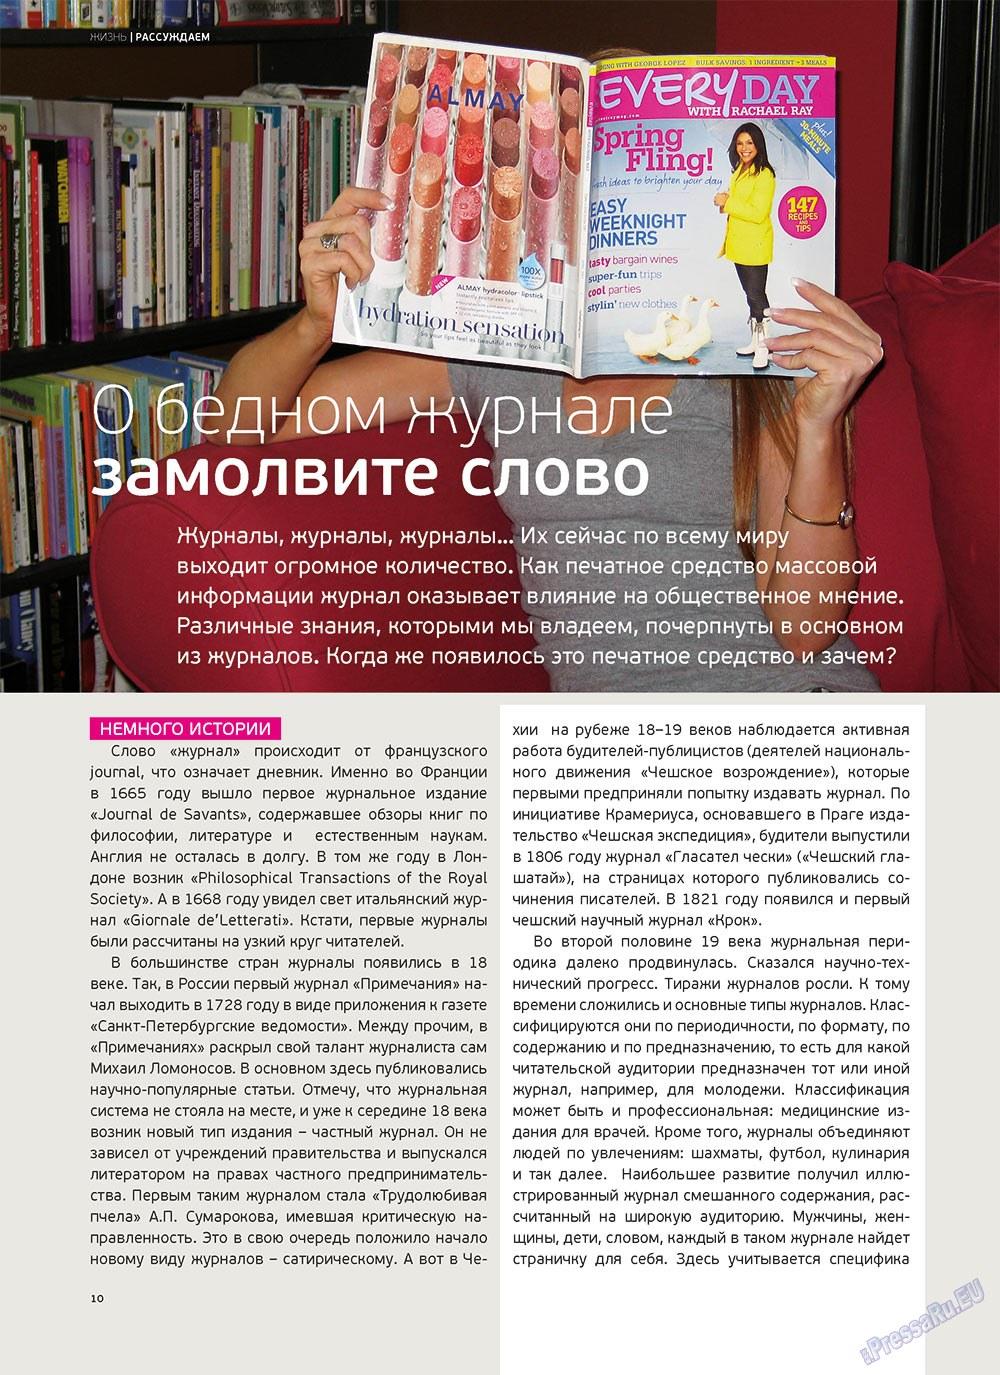 Артек (журнал). 2012 год, номер 5, стр. 12